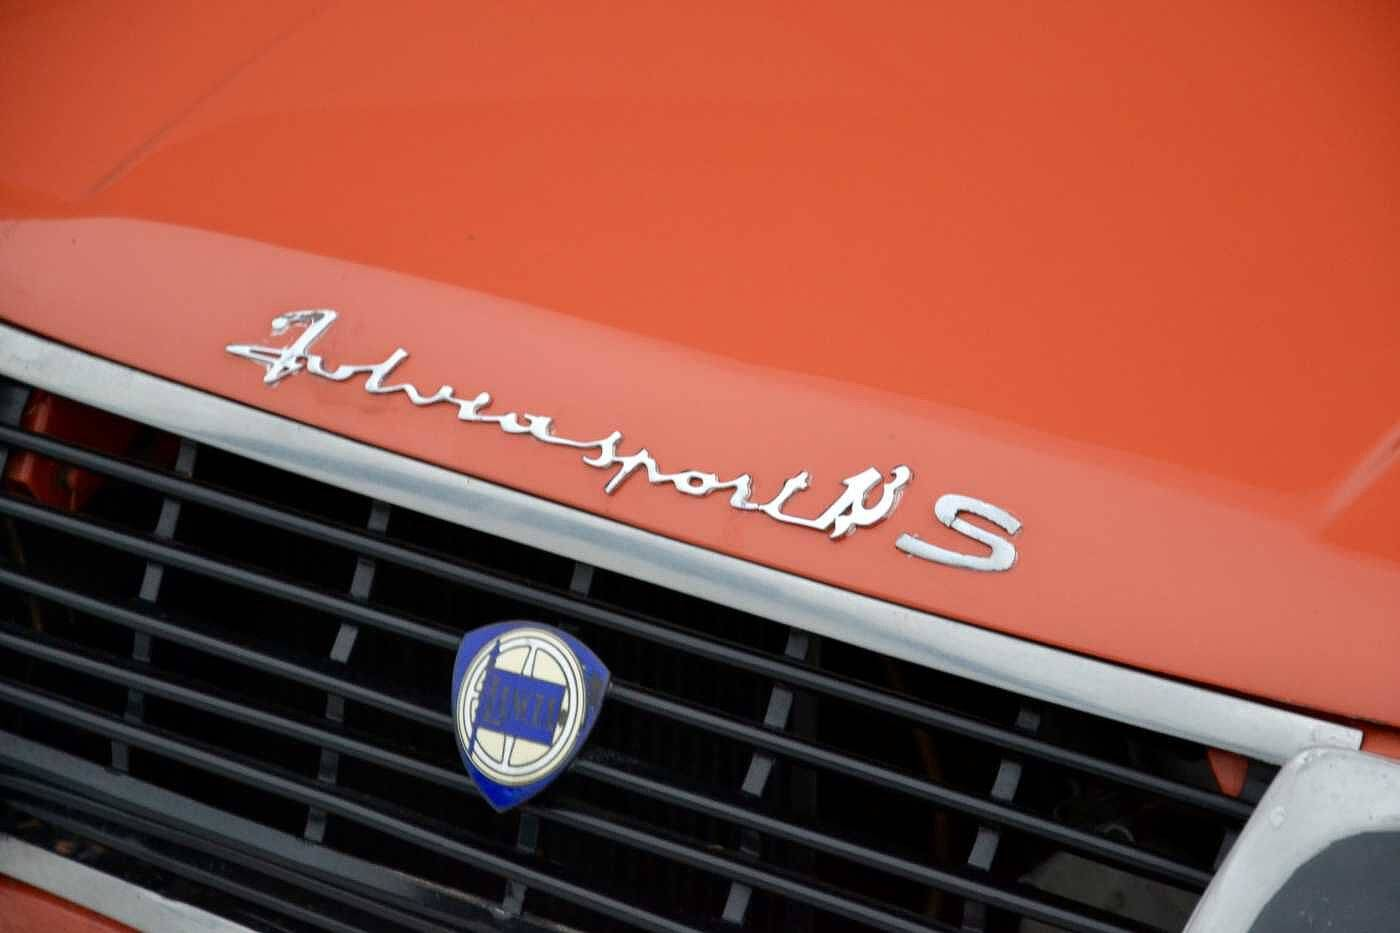 Lancia Fulvia ZAGATO 1300 S